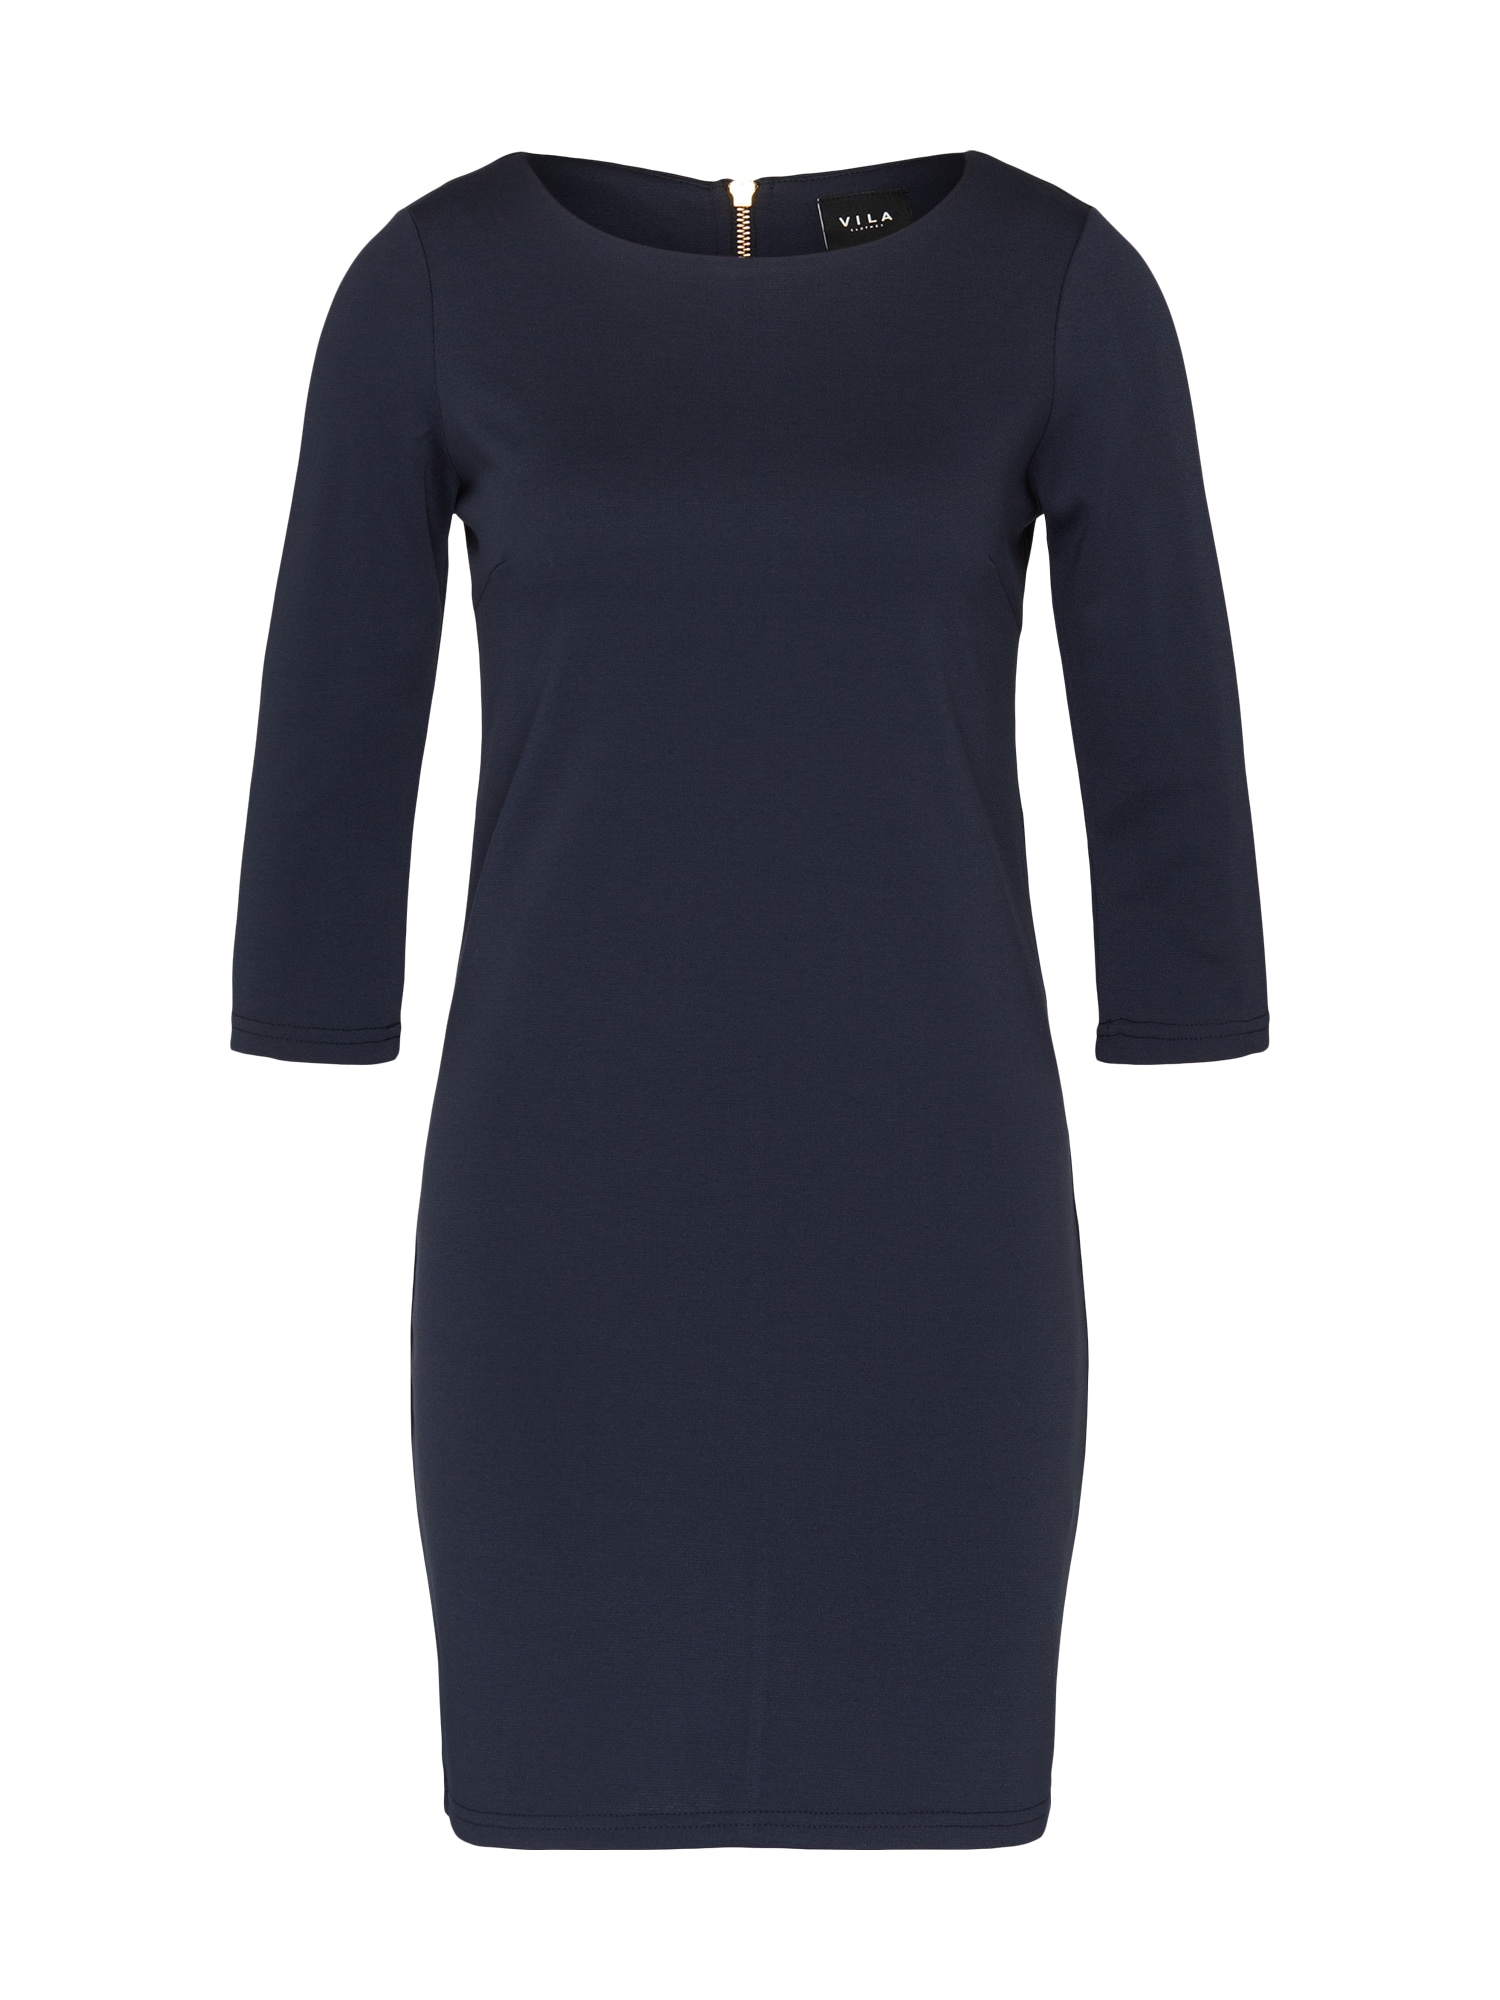 Jerseykleid 'VITinny'   Bekleidung > Kleider > Jerseykleider   Vila